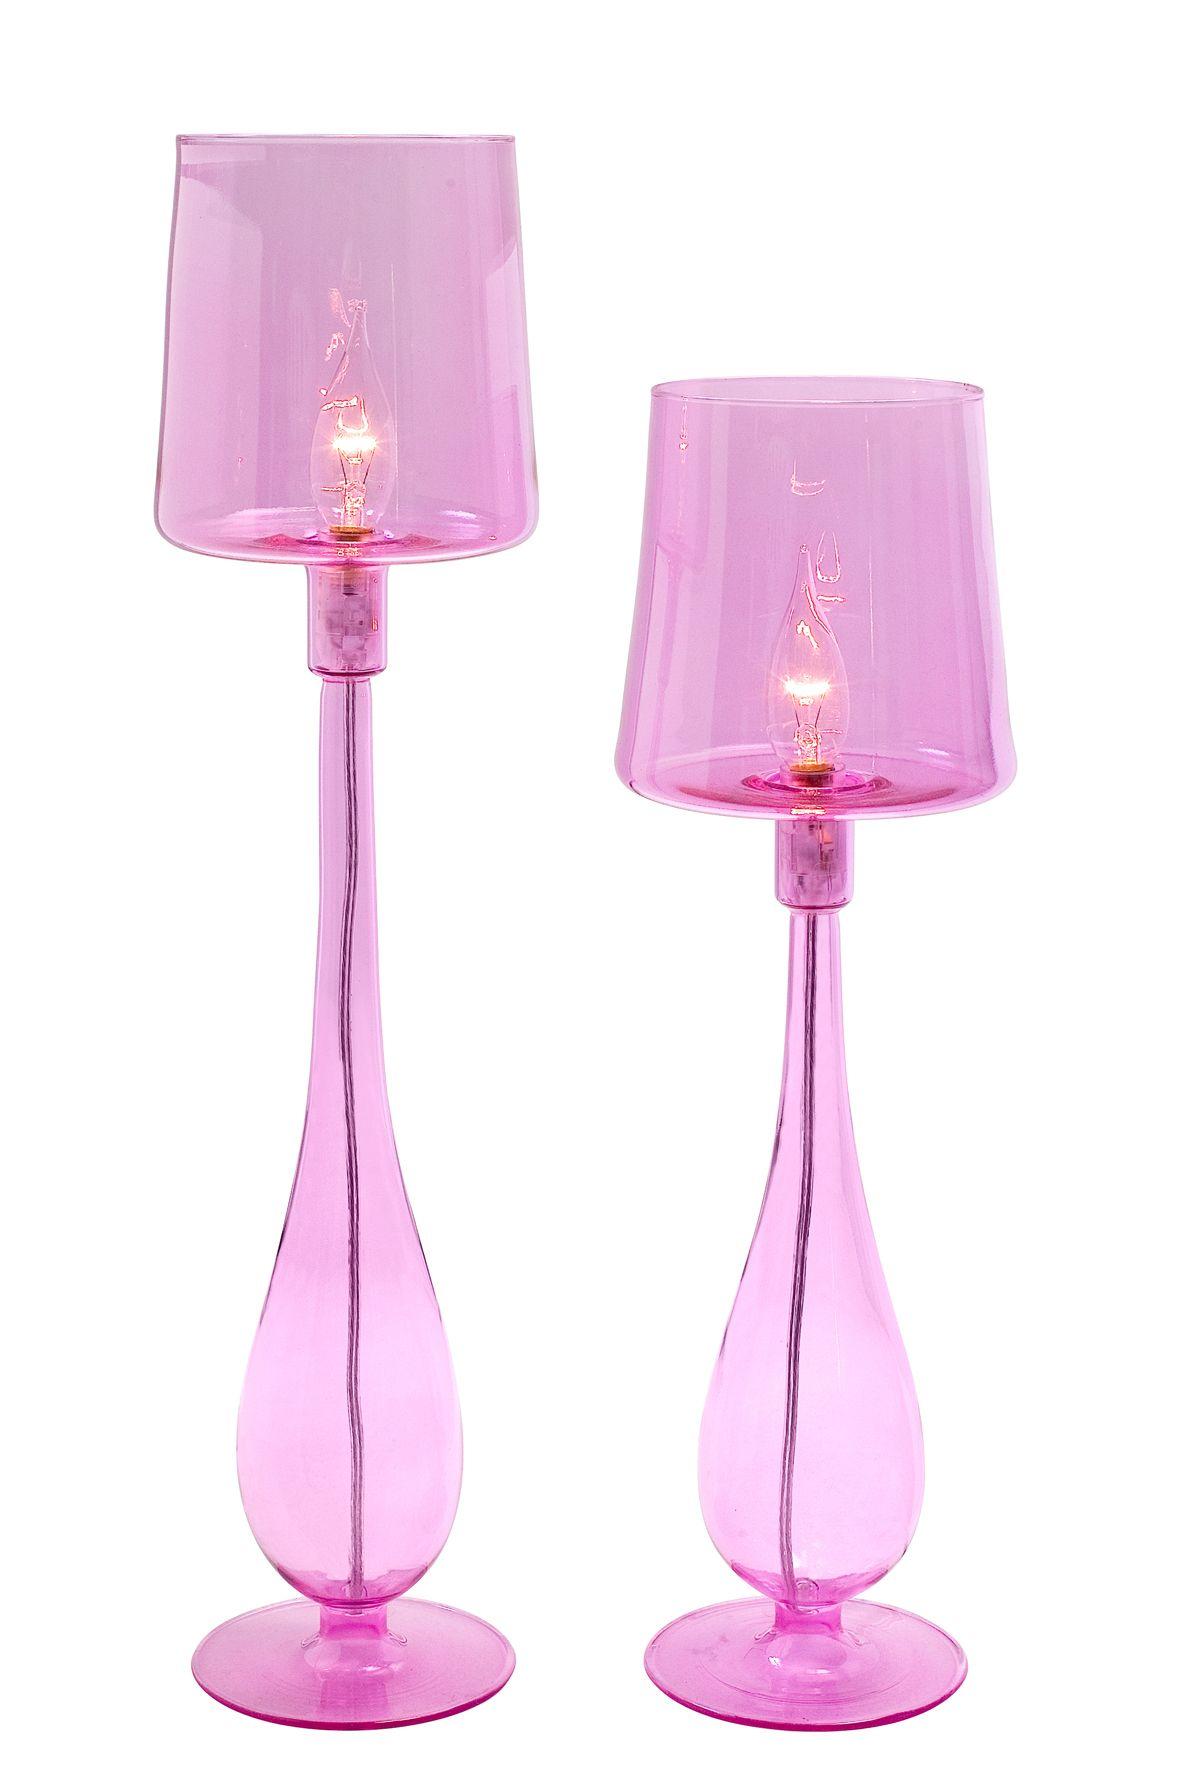 LES HERITIERS - Lampes Goutte #lamp #lampe #light #decoration #home ...